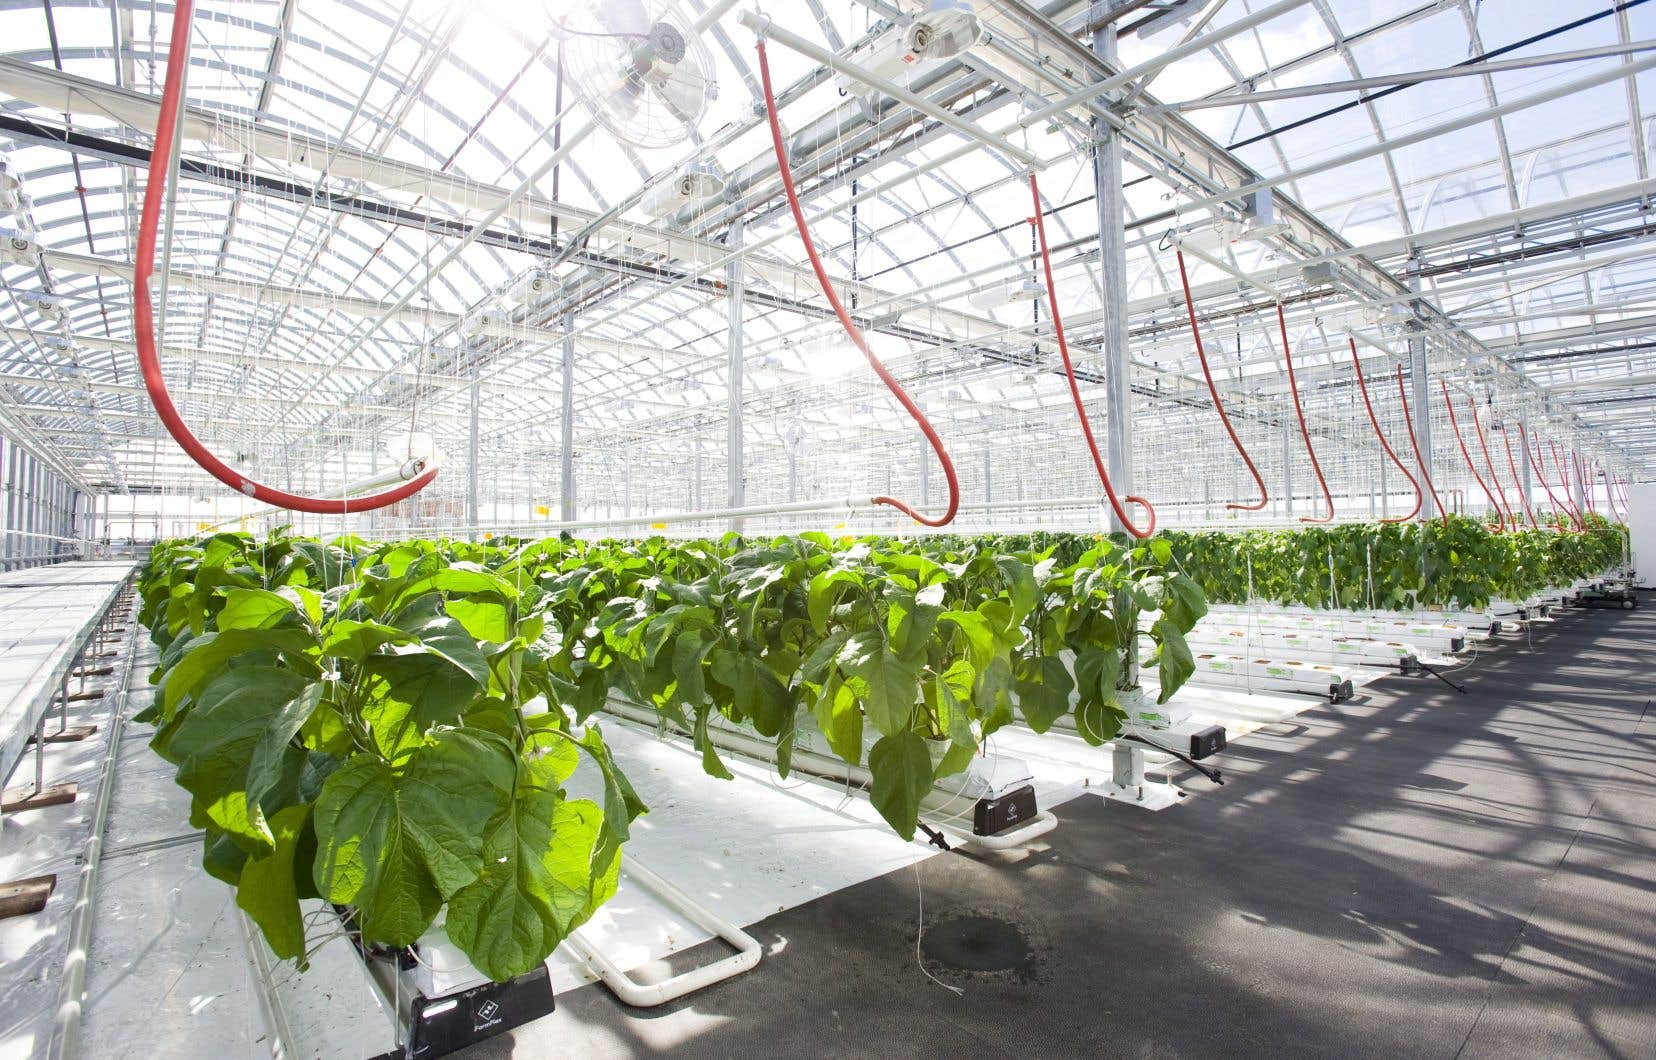 Les producteurs serricoles obtiennent un tarif préférentiel d'Hydro-Québec